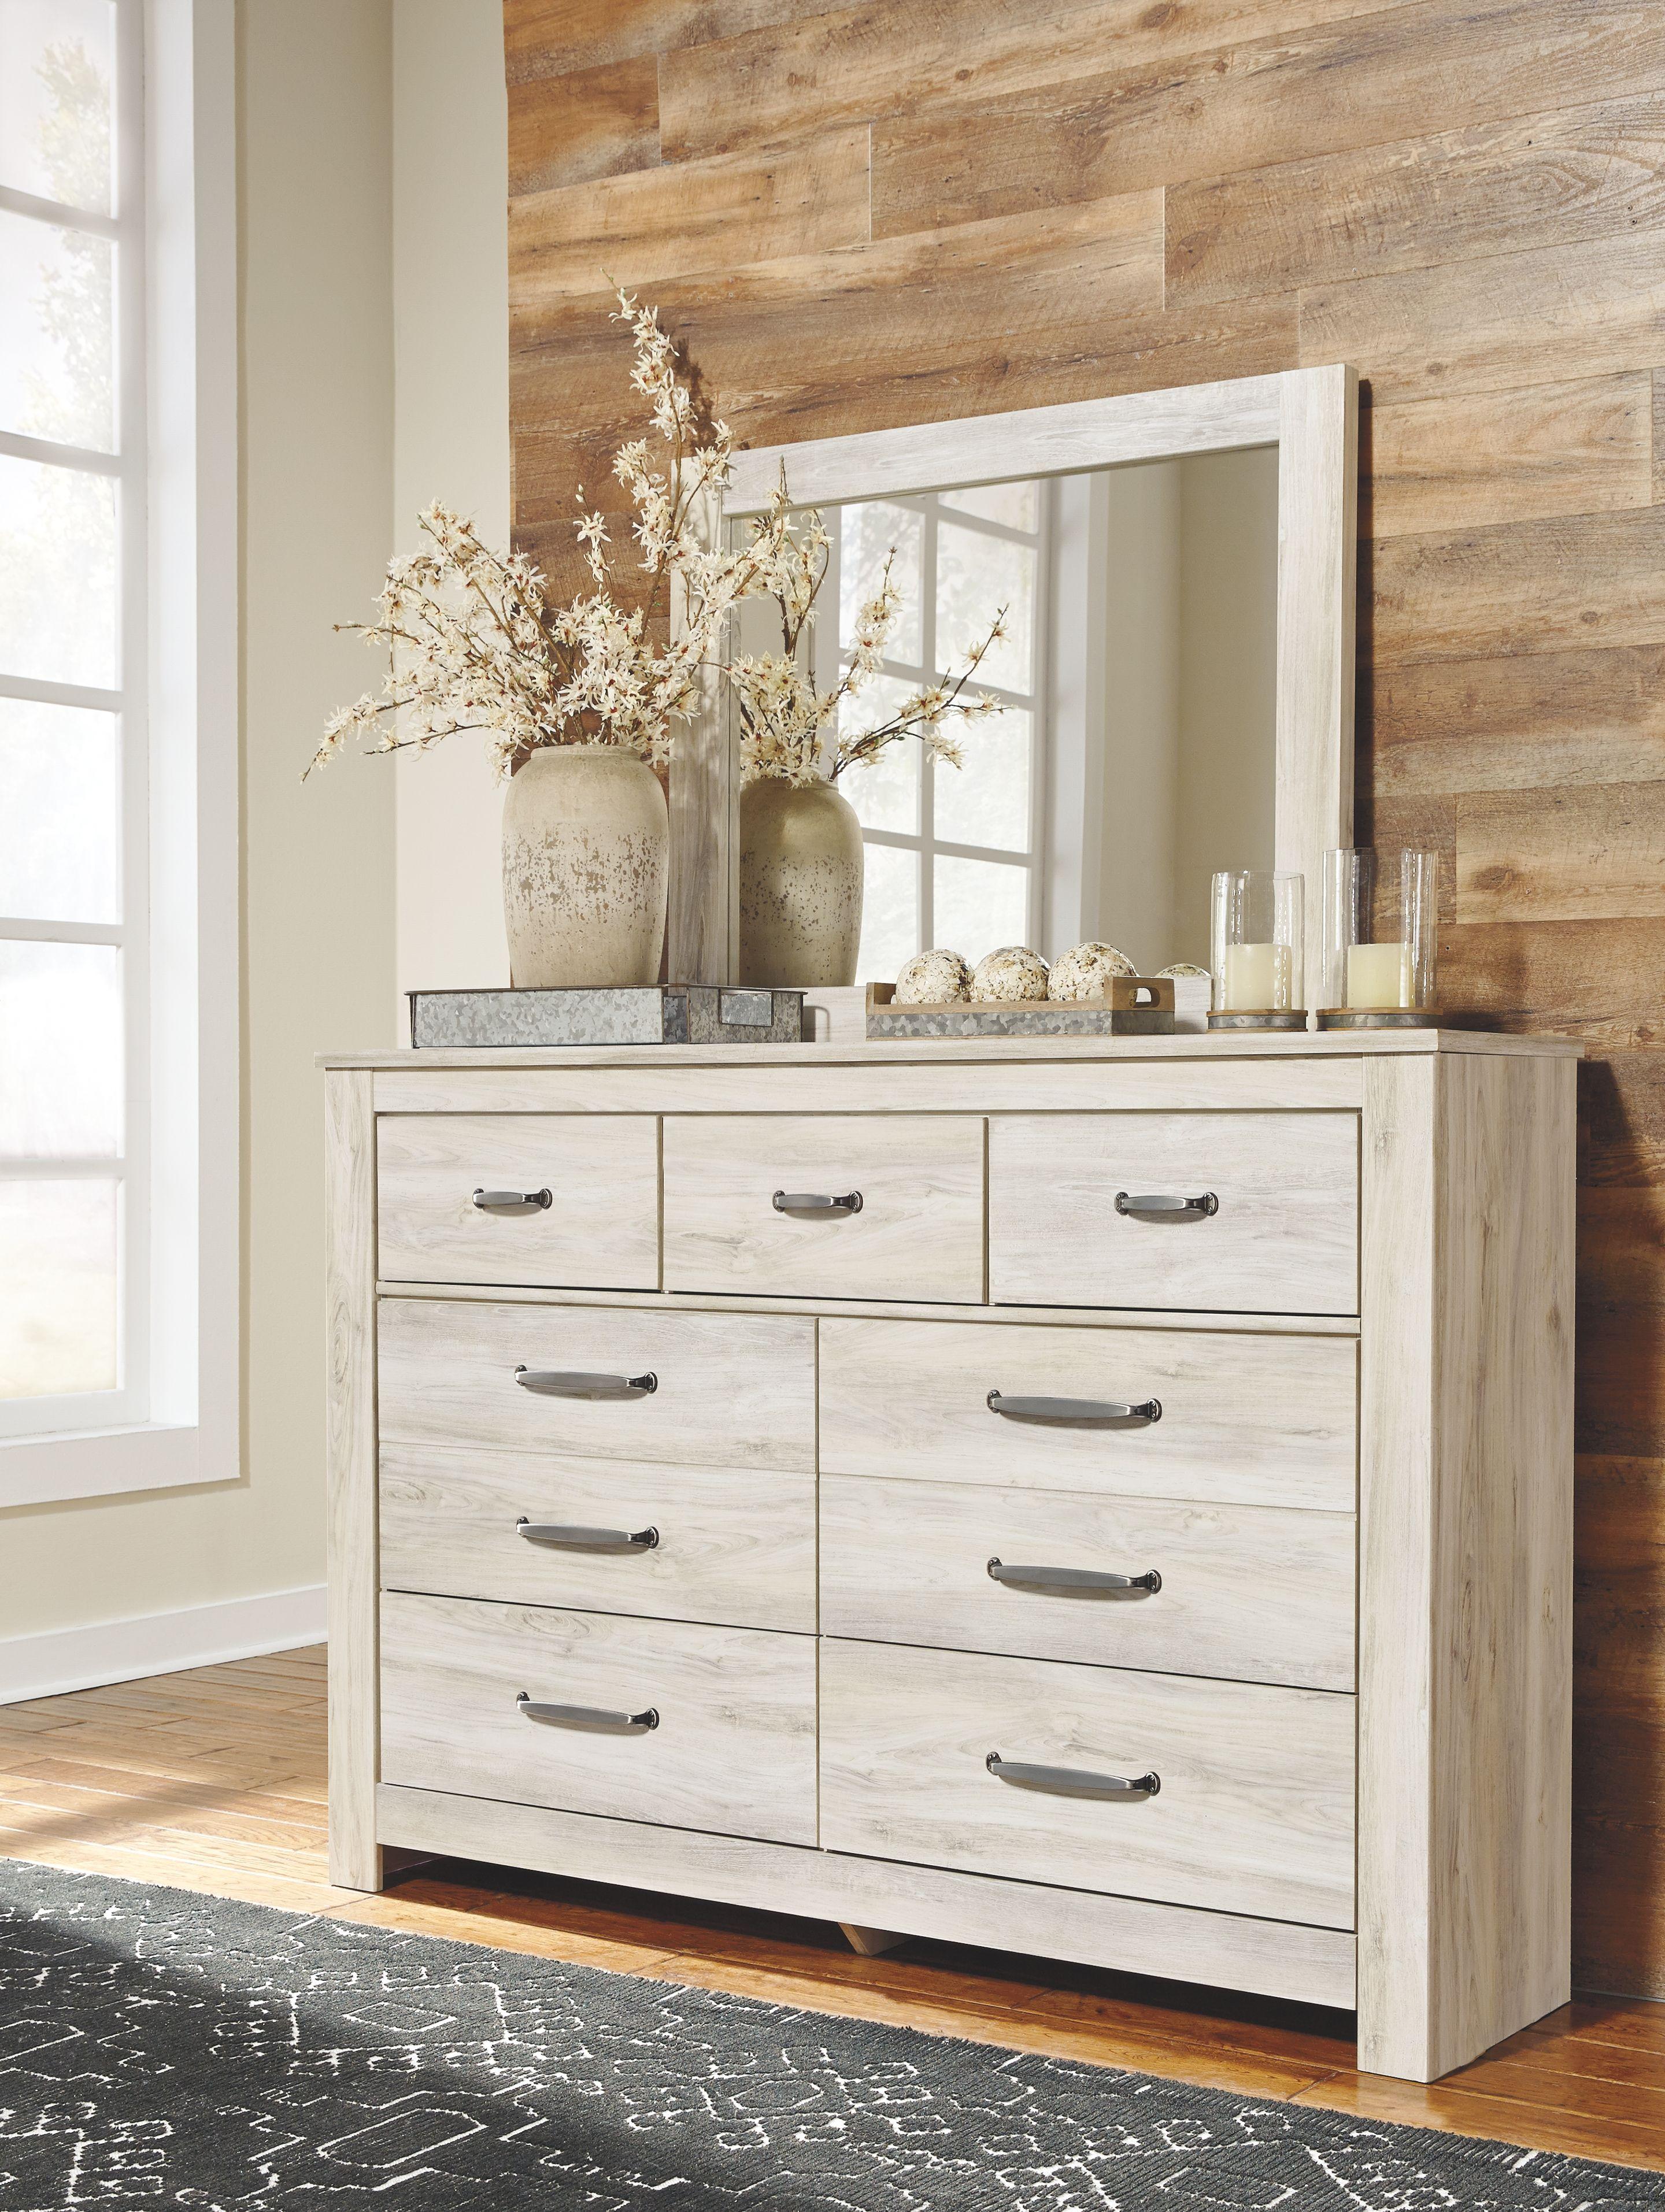 Bellaby Dresser And Mirror Ashley Furniture Homestore Dresser Decor Bedroom Dresser Design Dresser Decor [ 3827 x 2880 Pixel ]